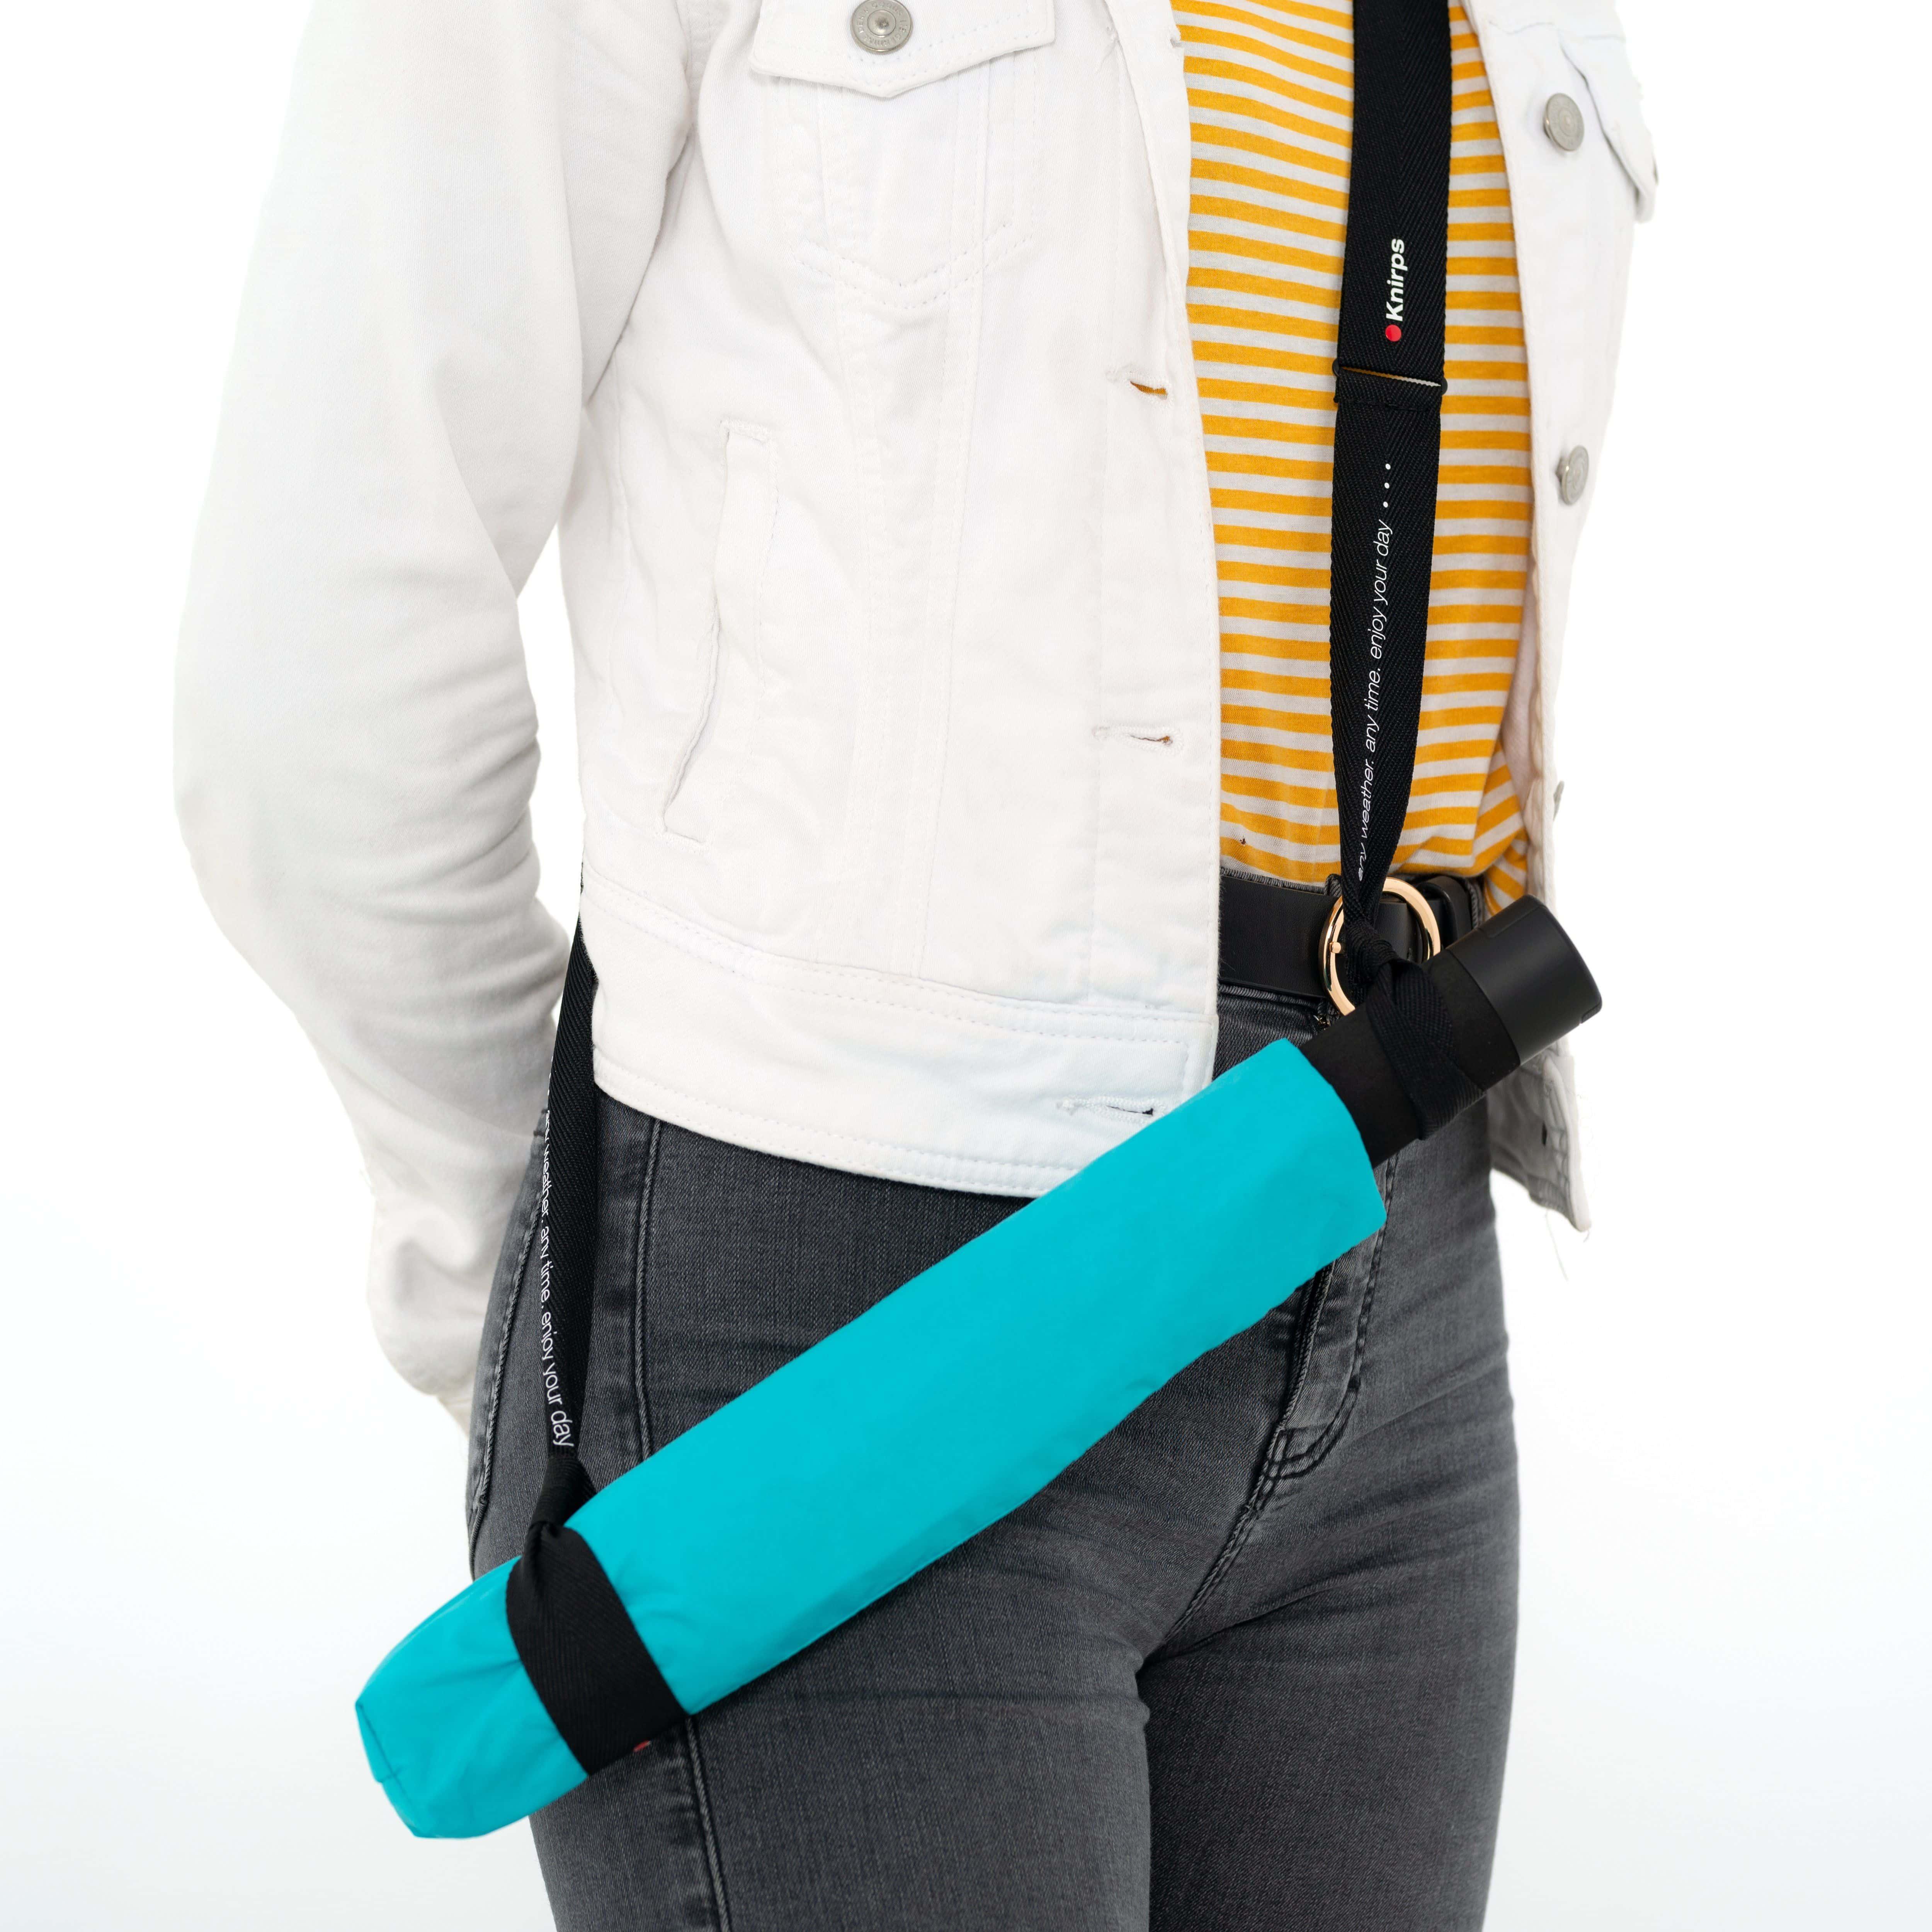 Knirps Rainwear Accessoires Umbrella2Go Flex - photo 2